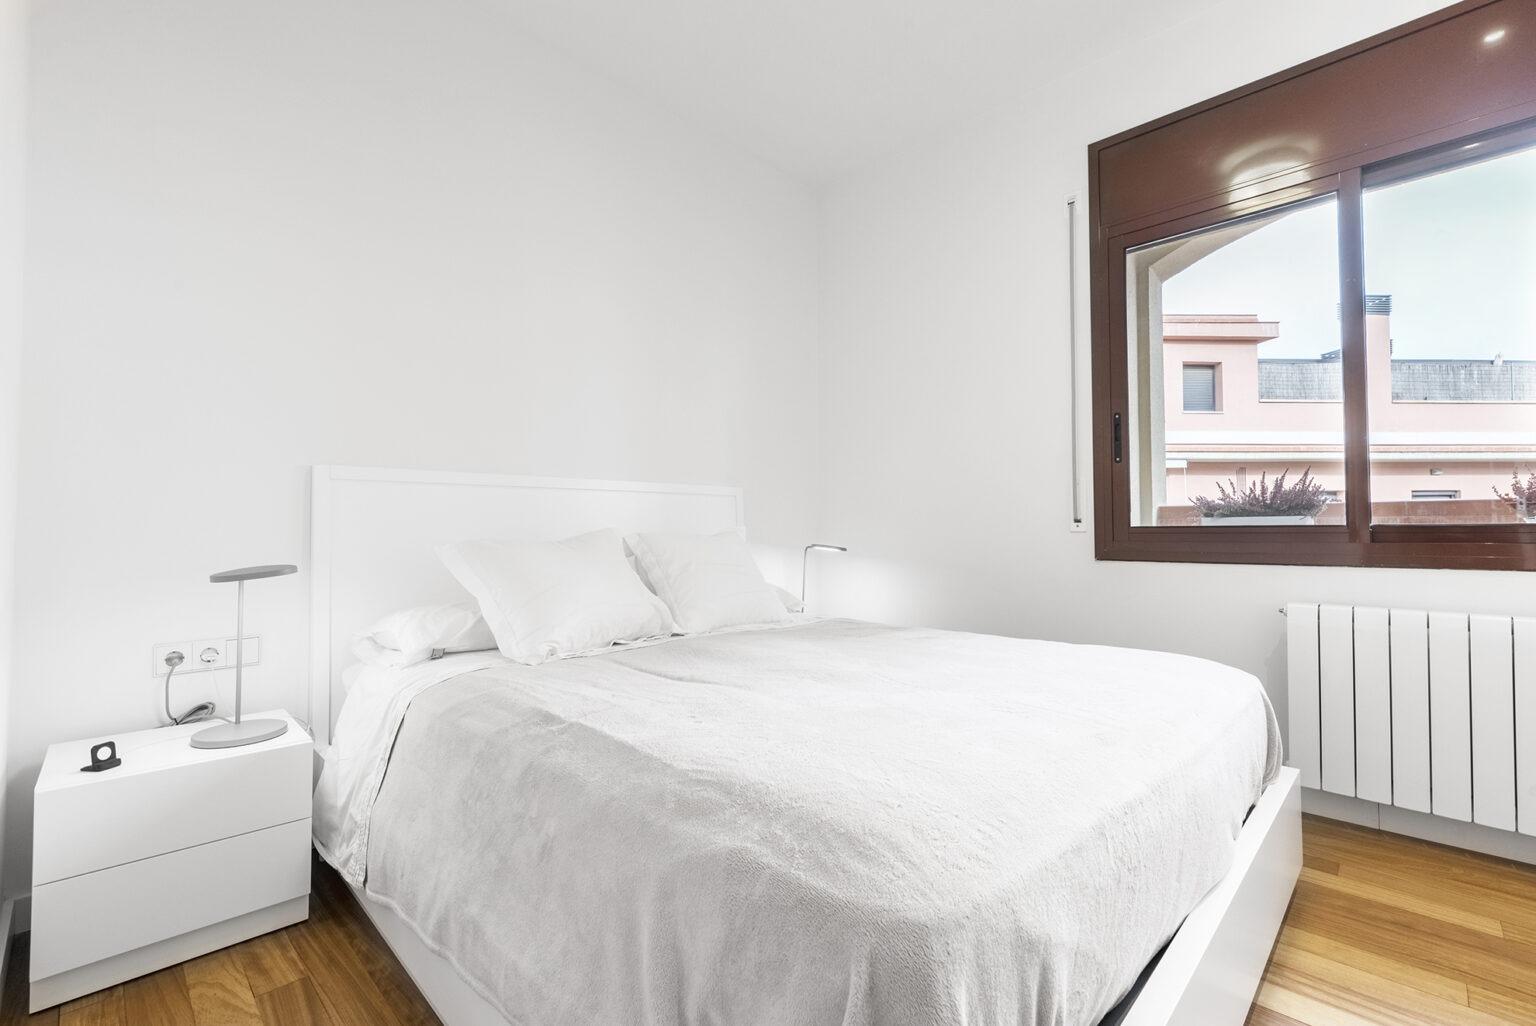 nordic-barcelona-habitacion (2)